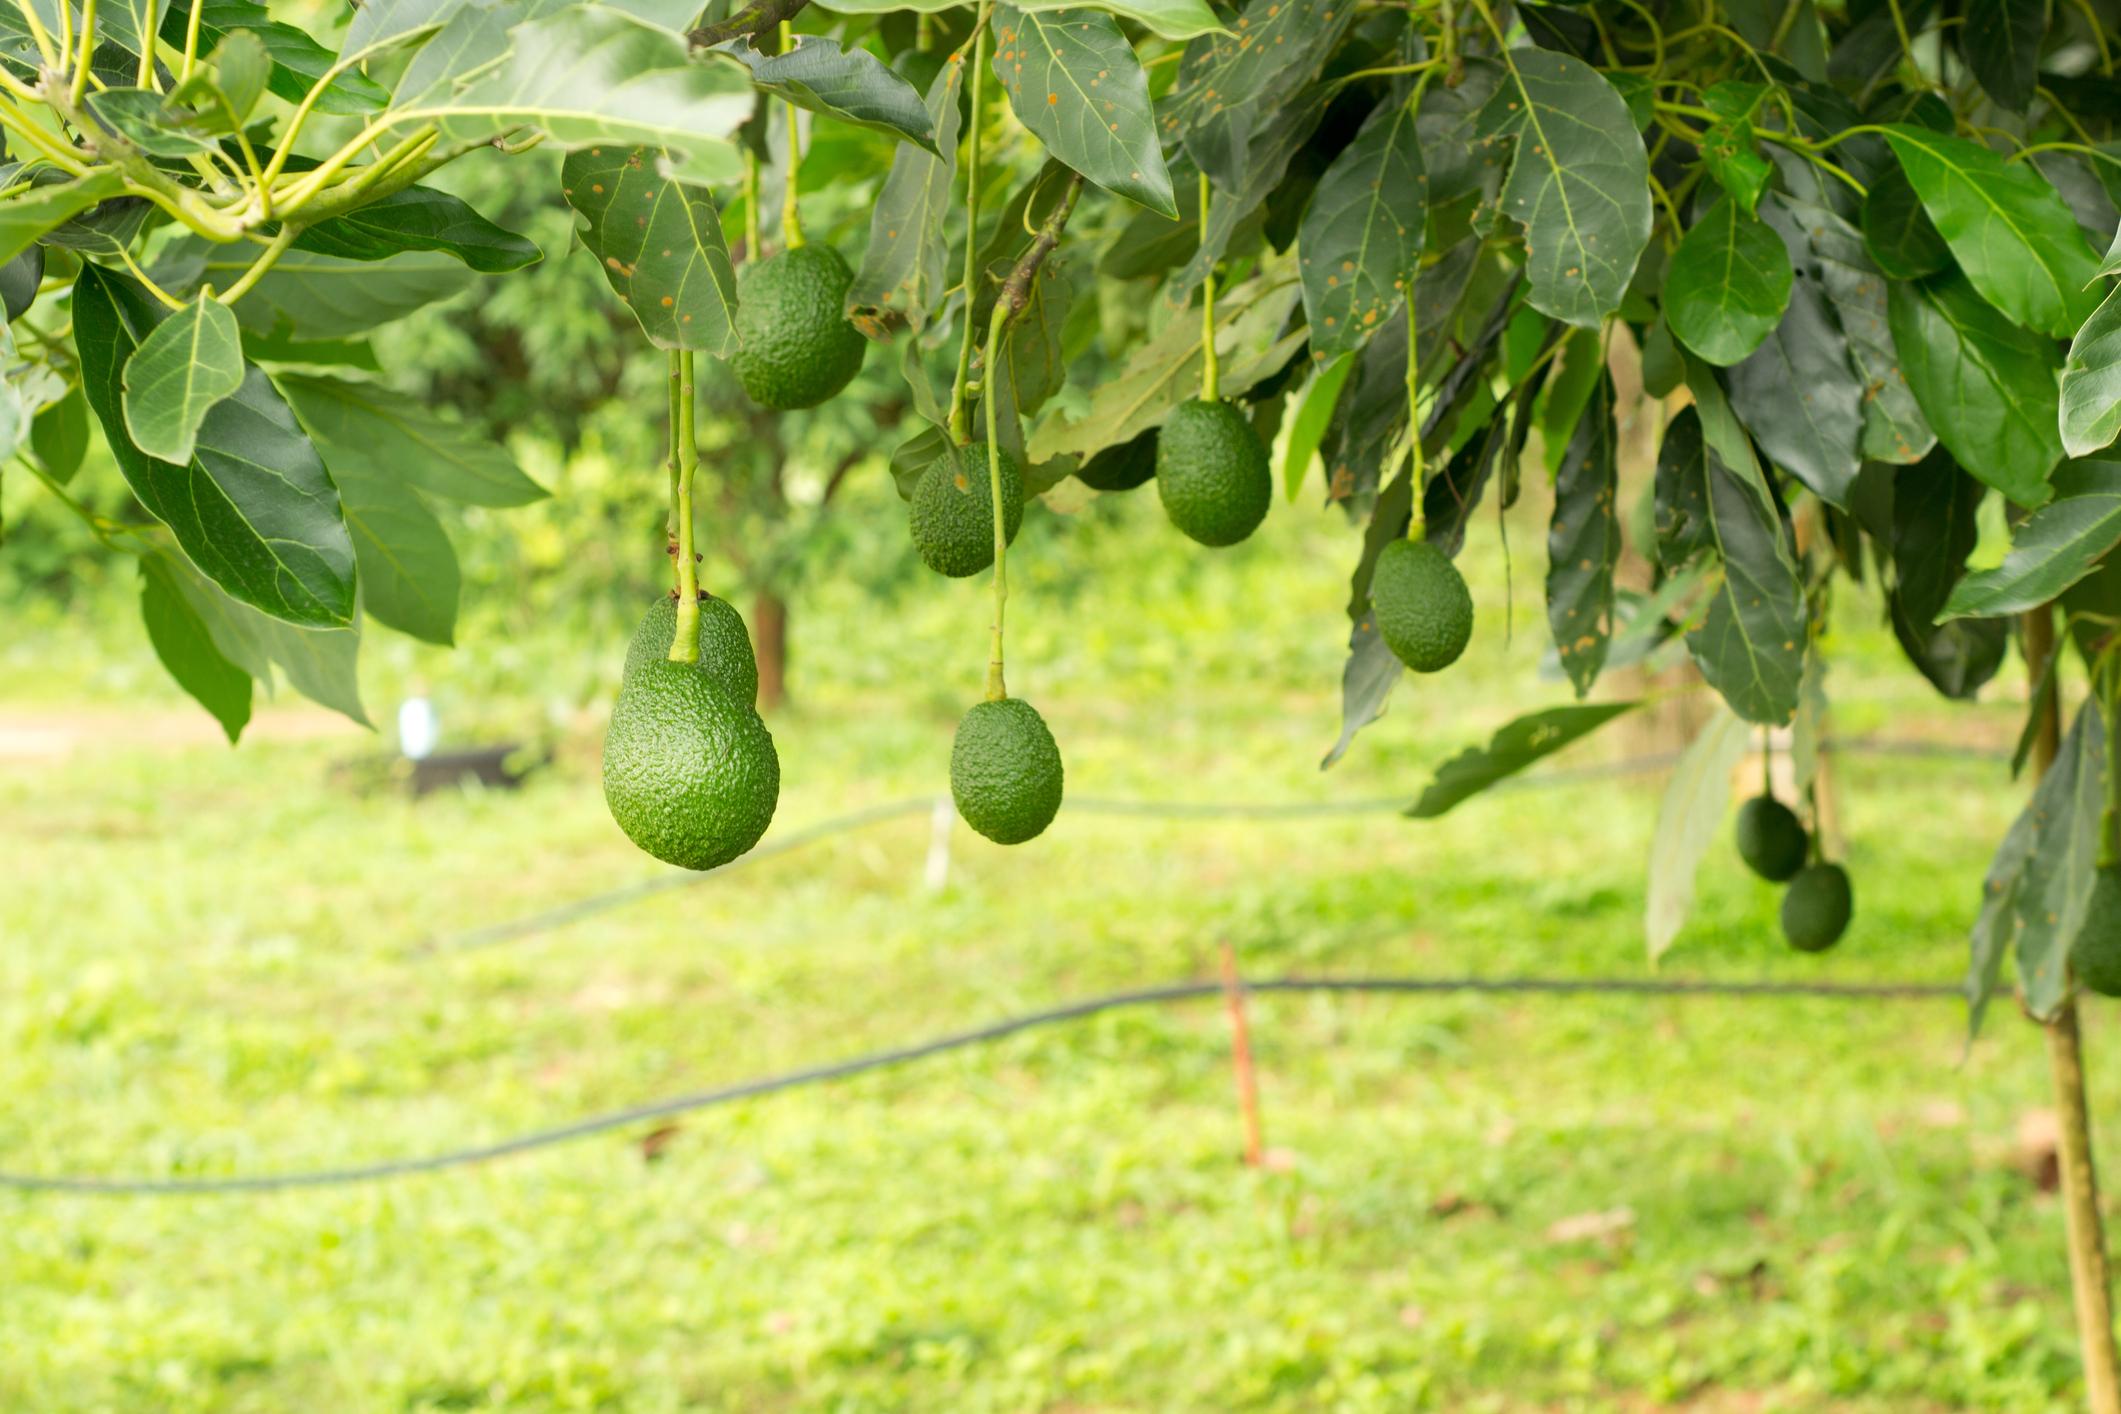 Ripe avocados growing on a tree.